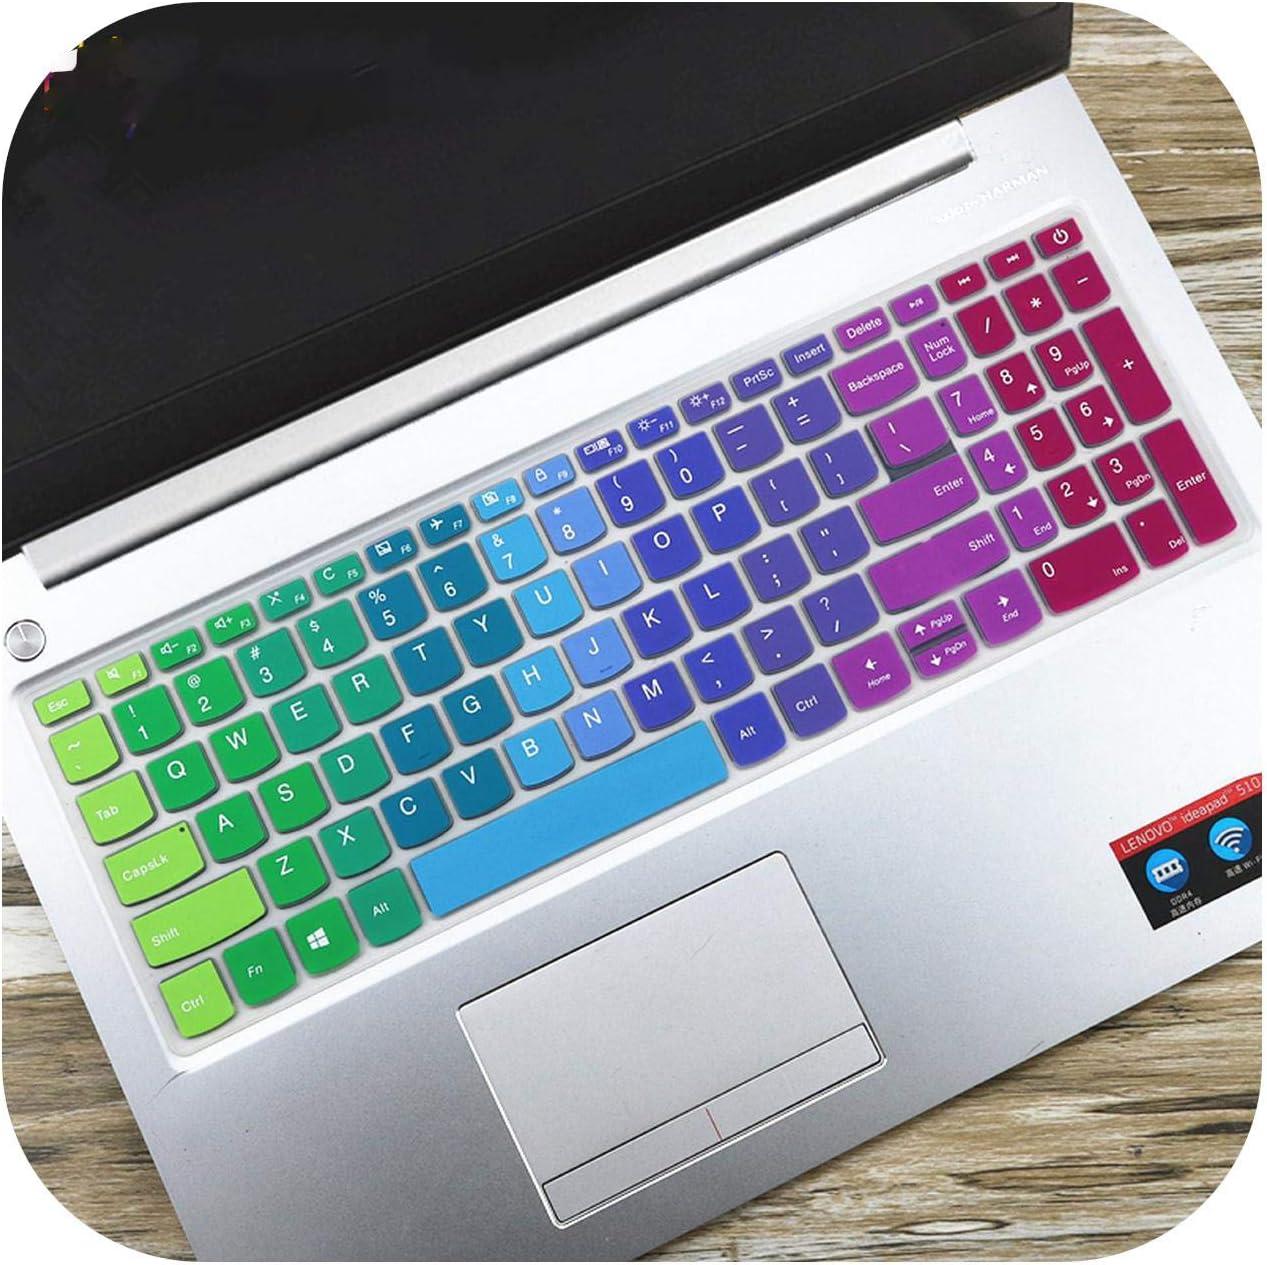 Laptop Keyboard Cover Skin for Lenovo Ideapad 330 S 15.6 15 330S V330 15 15Ich 15Ikb 15Igm V330 15 330S 15 330S 15Ikb-Fadegreen